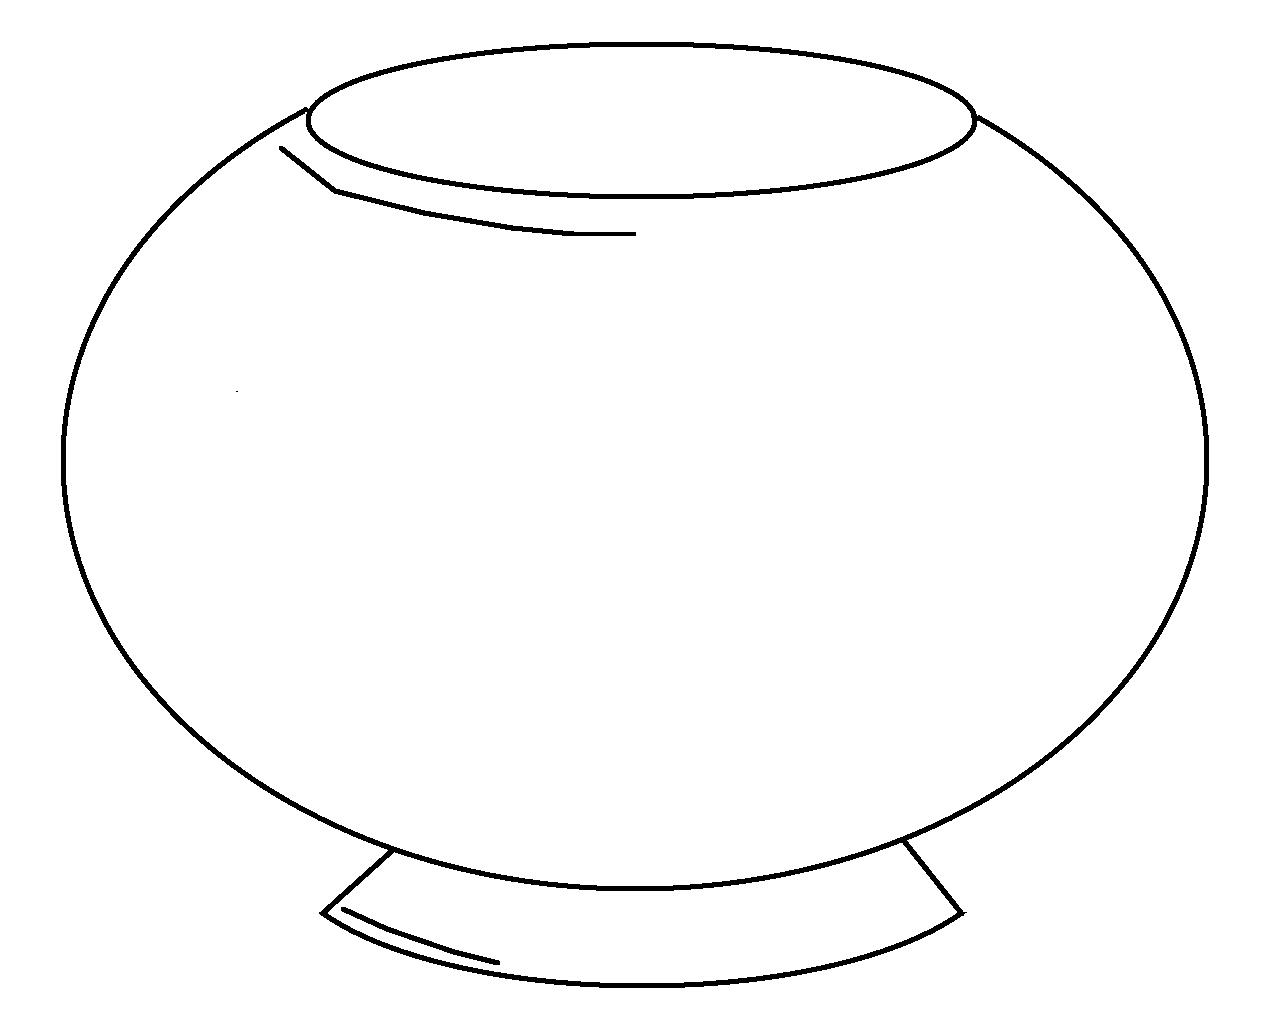 goldfish bowl coloring page fishbowl coloring page